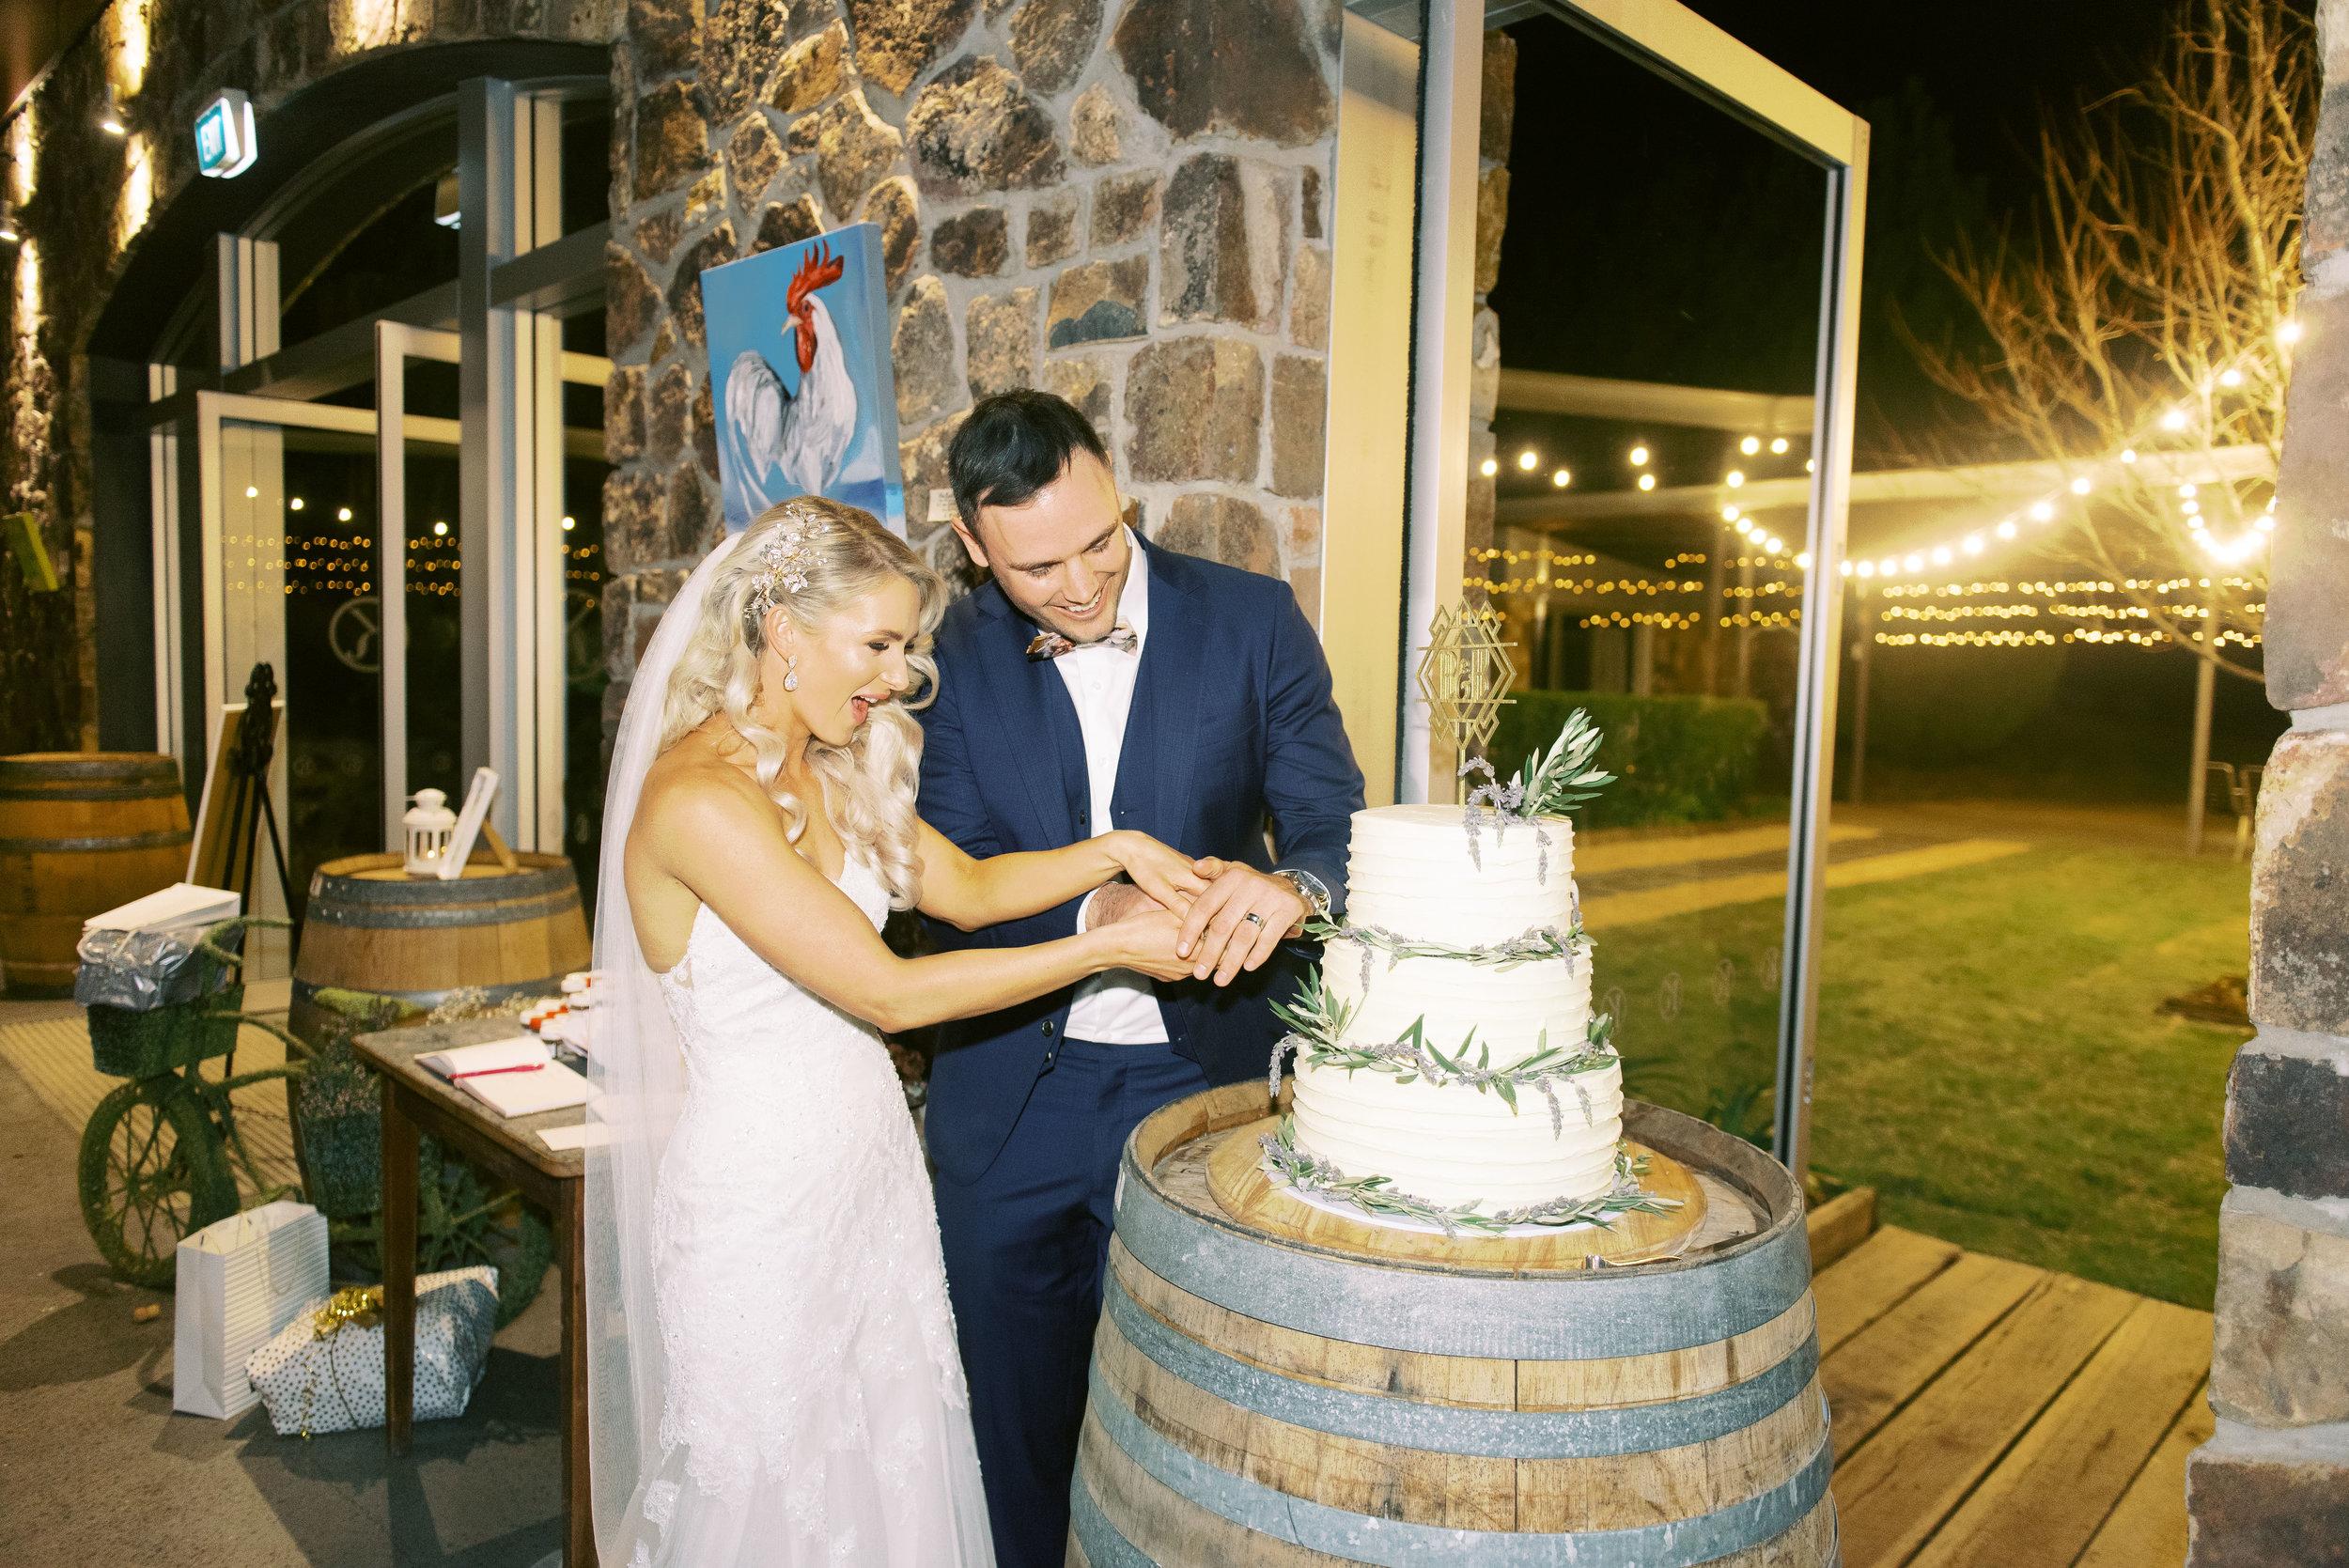 Kooroomba-Vineyard-Lavender-Farm-Wedding-Fine-Art-Lauren-Olivia-81.jpg